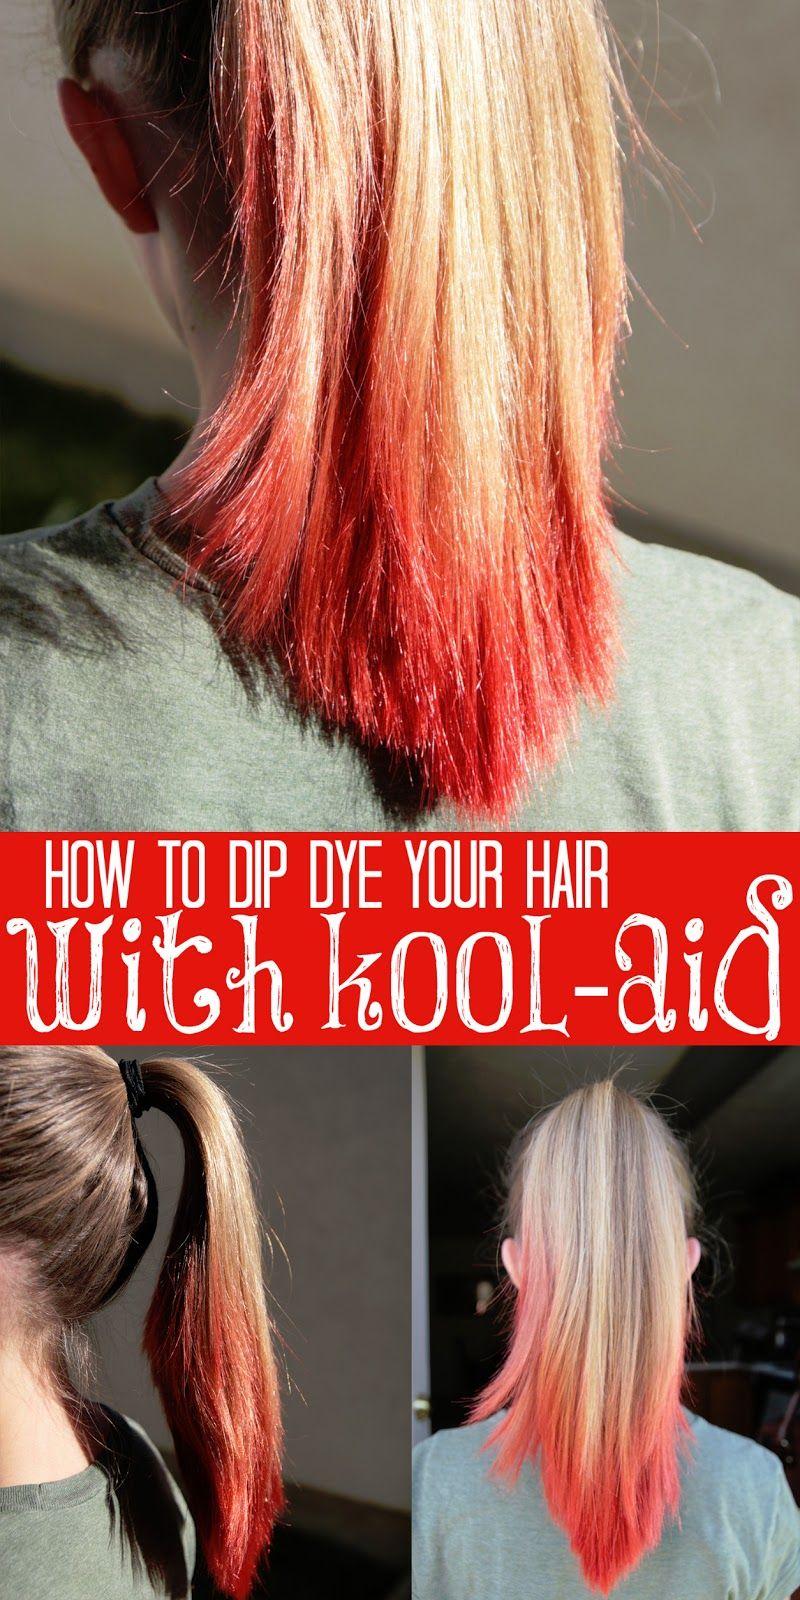 How To Dip Dye Your Hair With Kool Aid Kool Aid Hair Dye Kool Aid Hair Dyed Red Hair